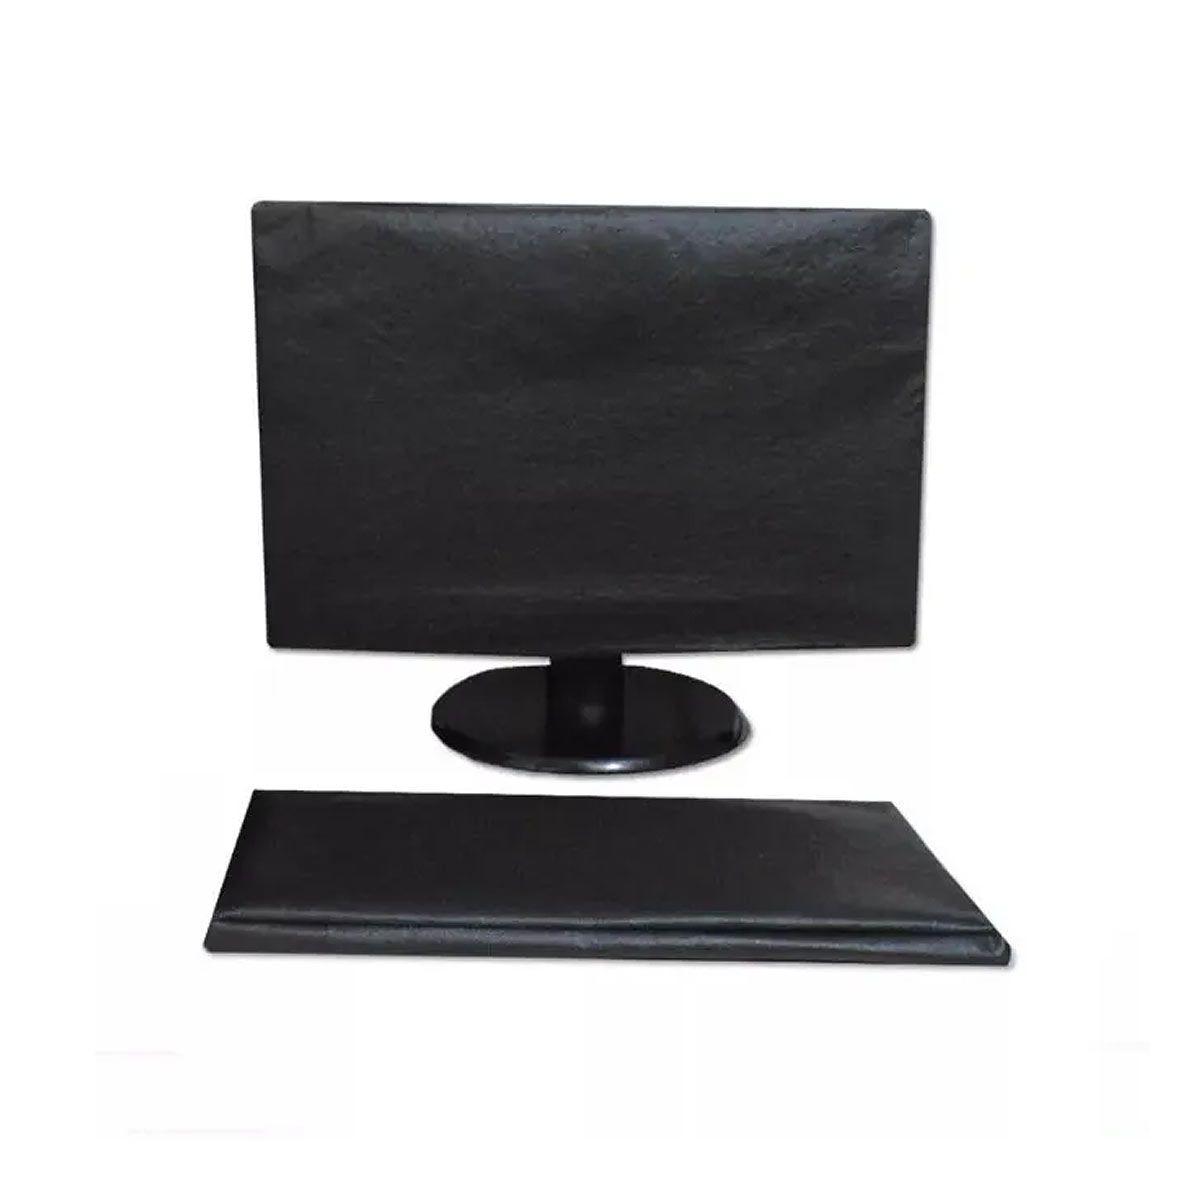 Capa Para Monitor E Teclado - Em Corino - Luxo